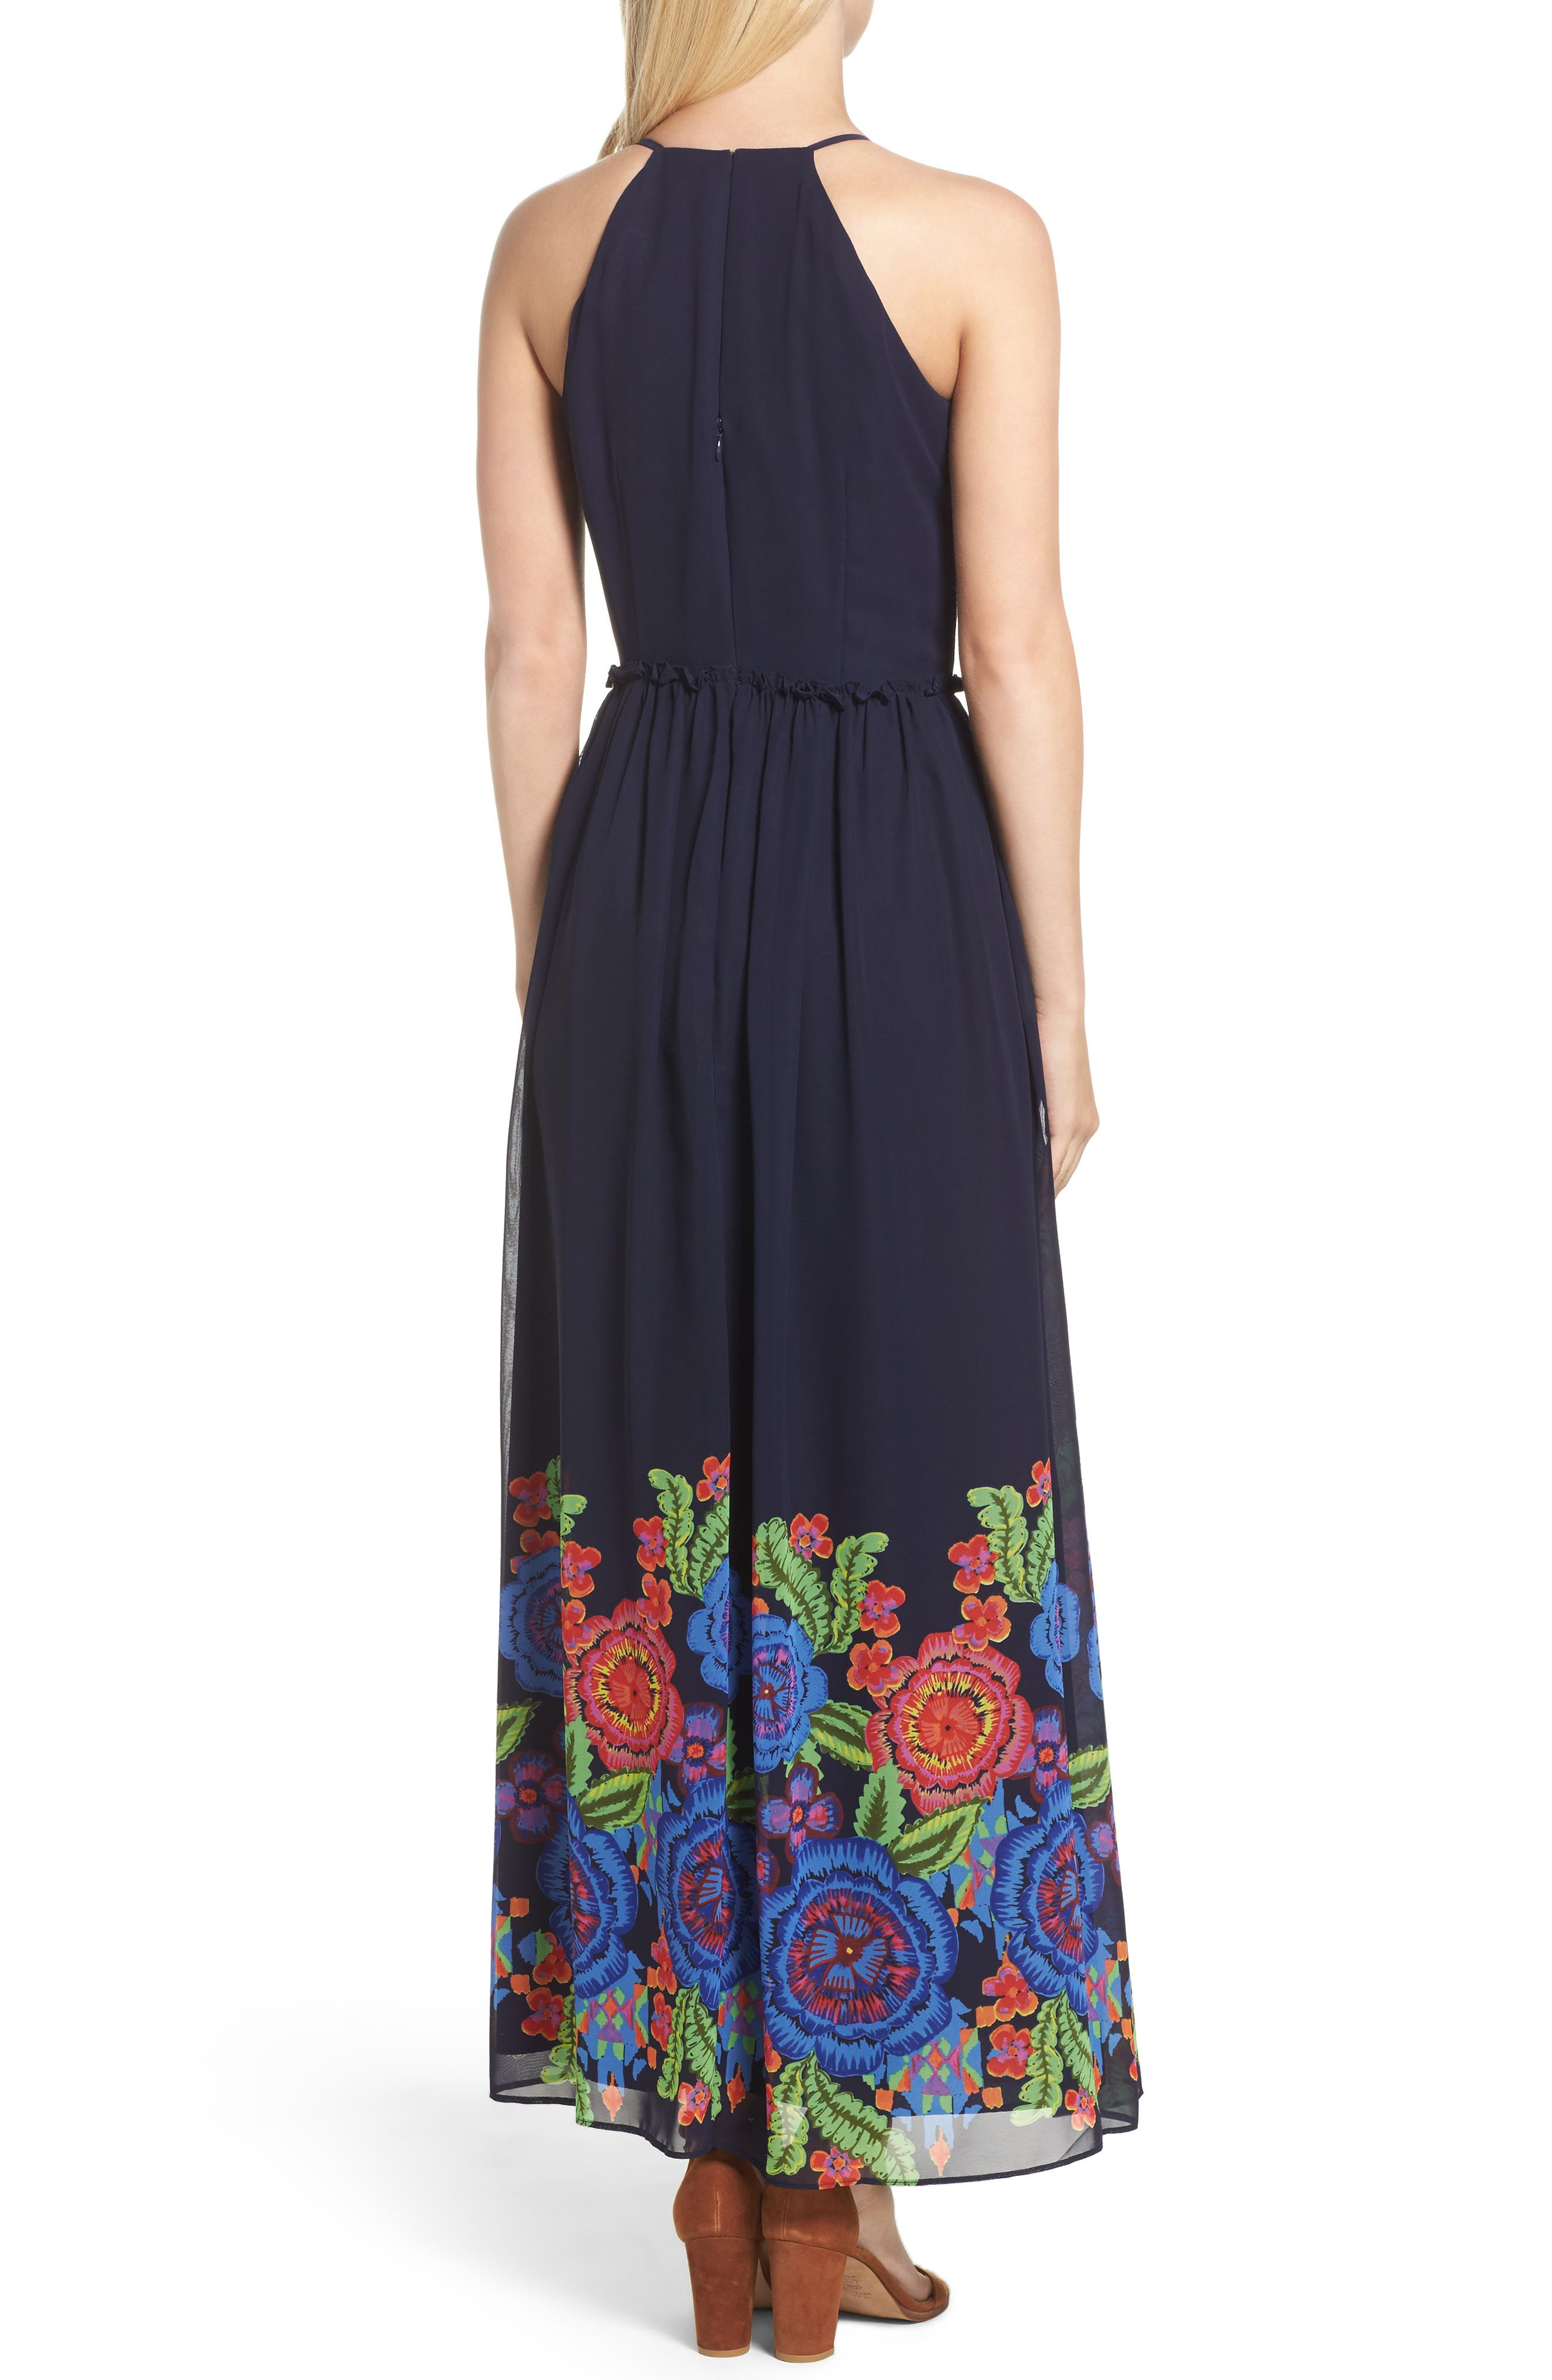 Zinnea Maxi Dress,                             Alternate thumbnail 2, color,